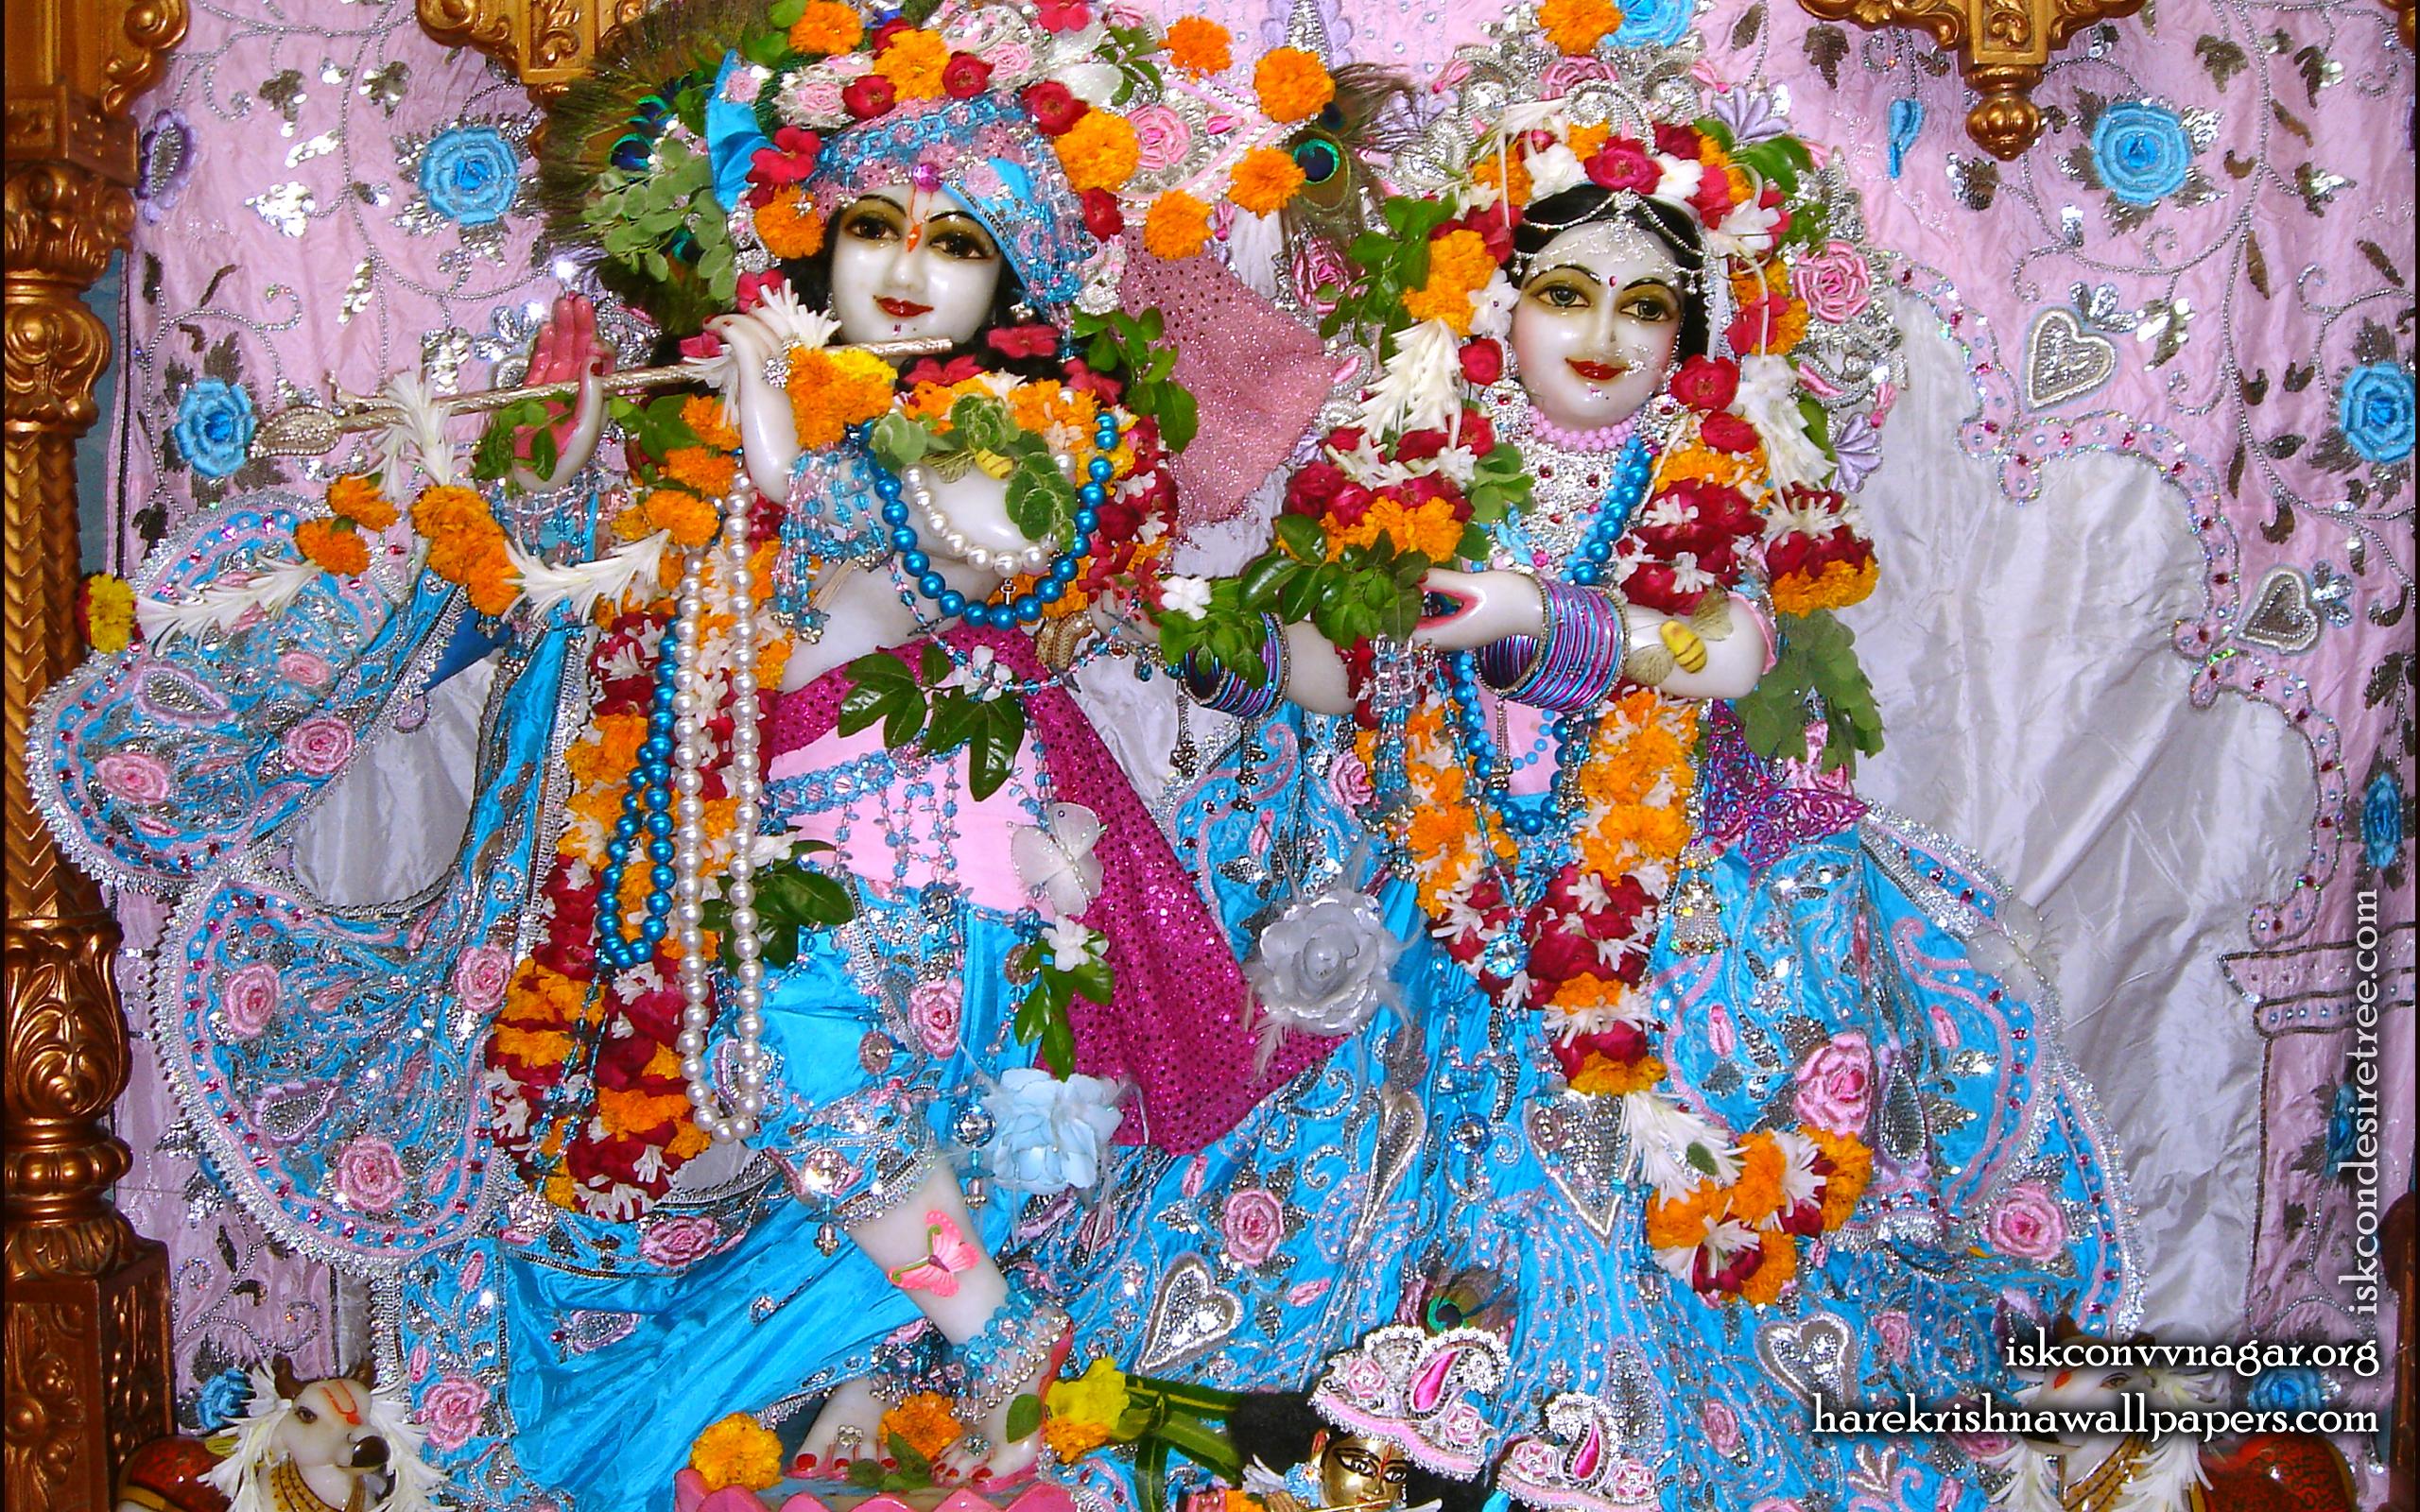 Sri Sri Radha Giridhari Wallpaper (019) Size 2560x1600 Download